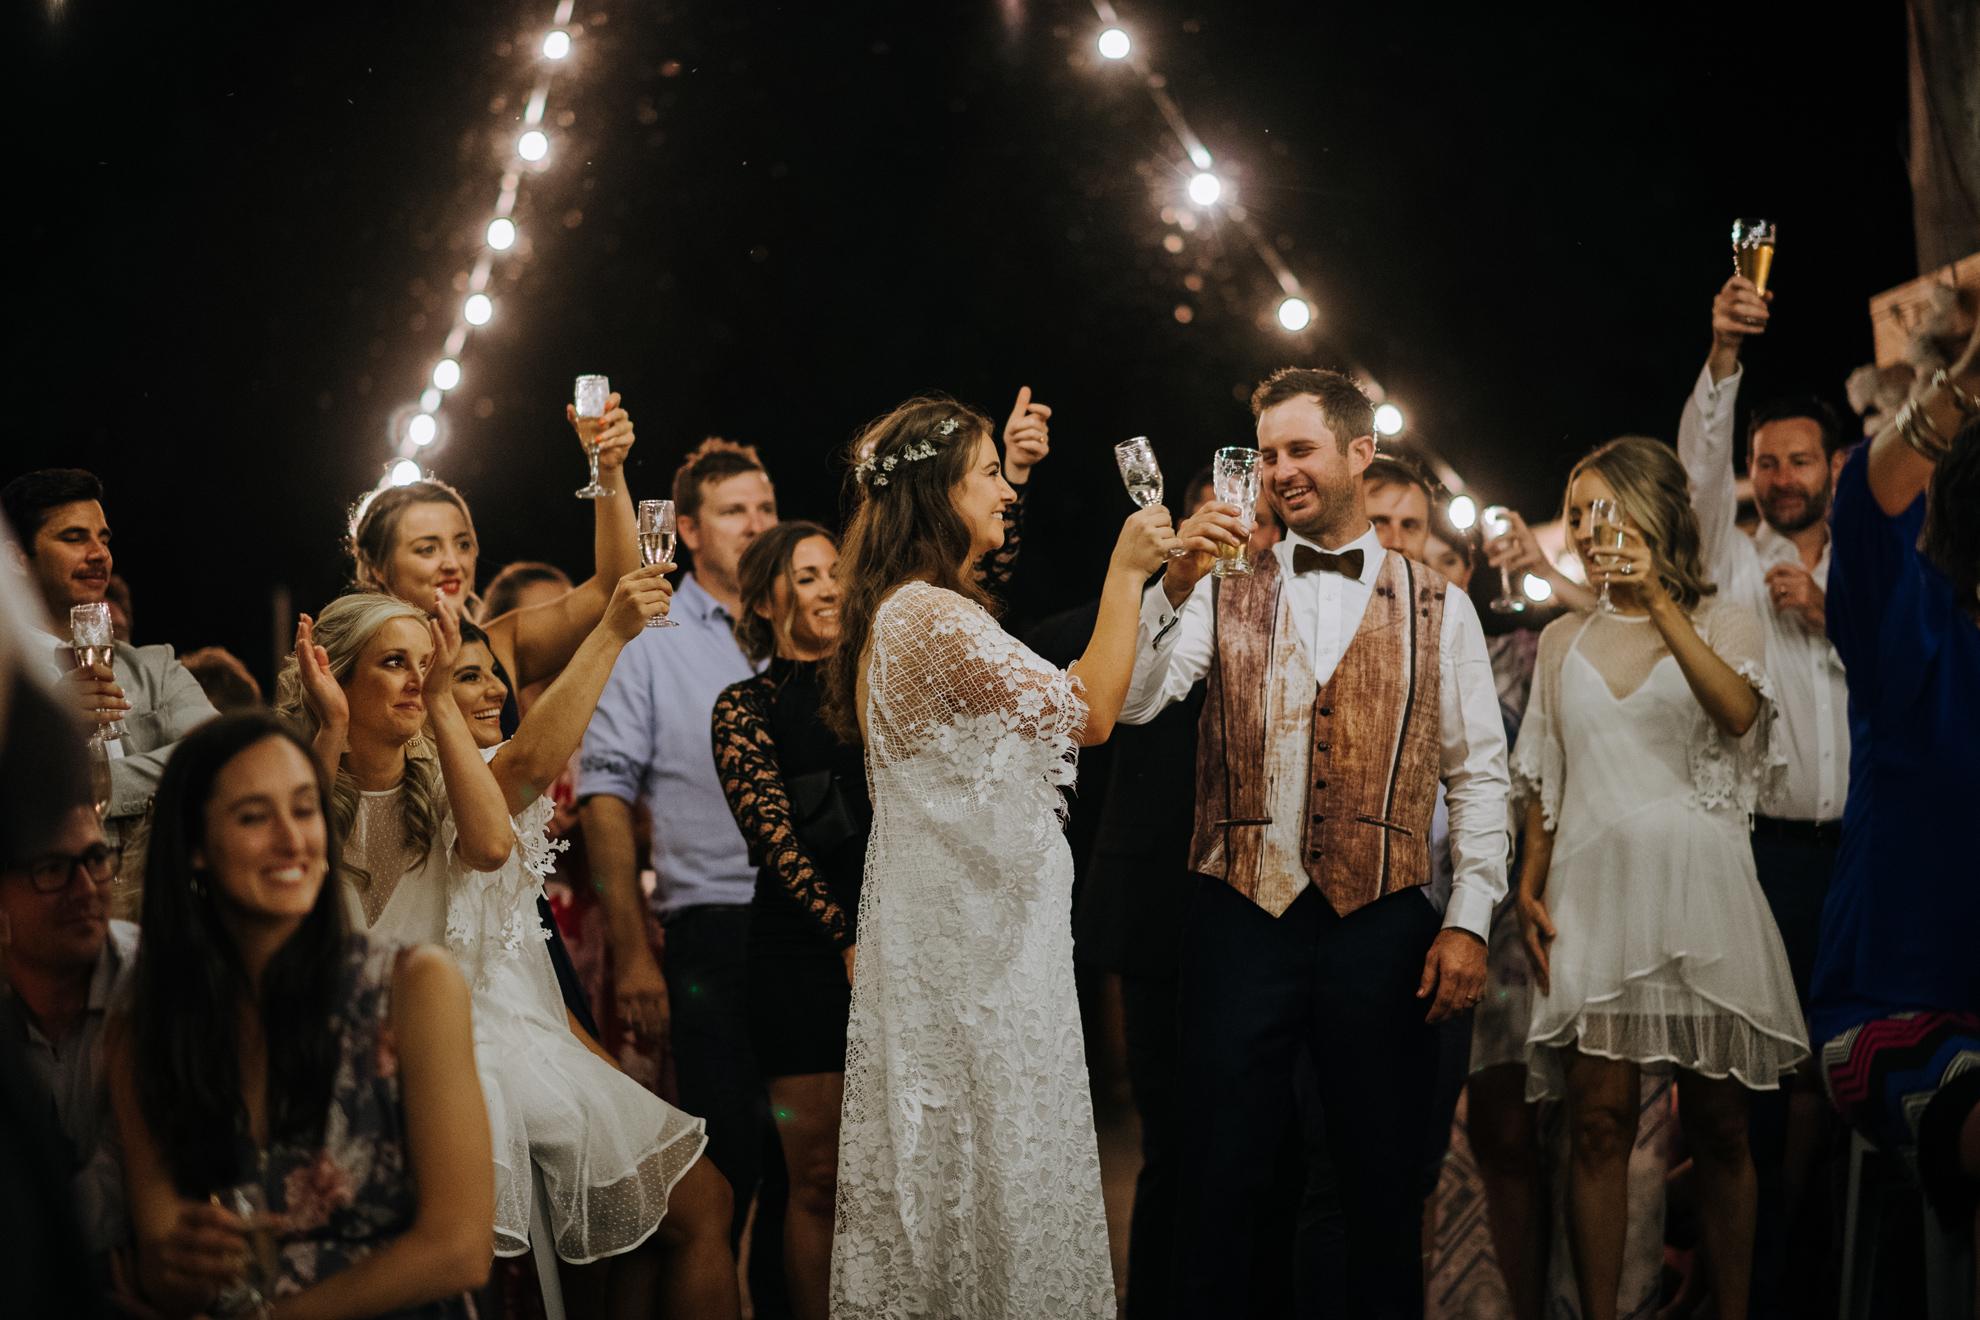 107-Jason_Jessie_Dalby_Country_Wedding.jpg